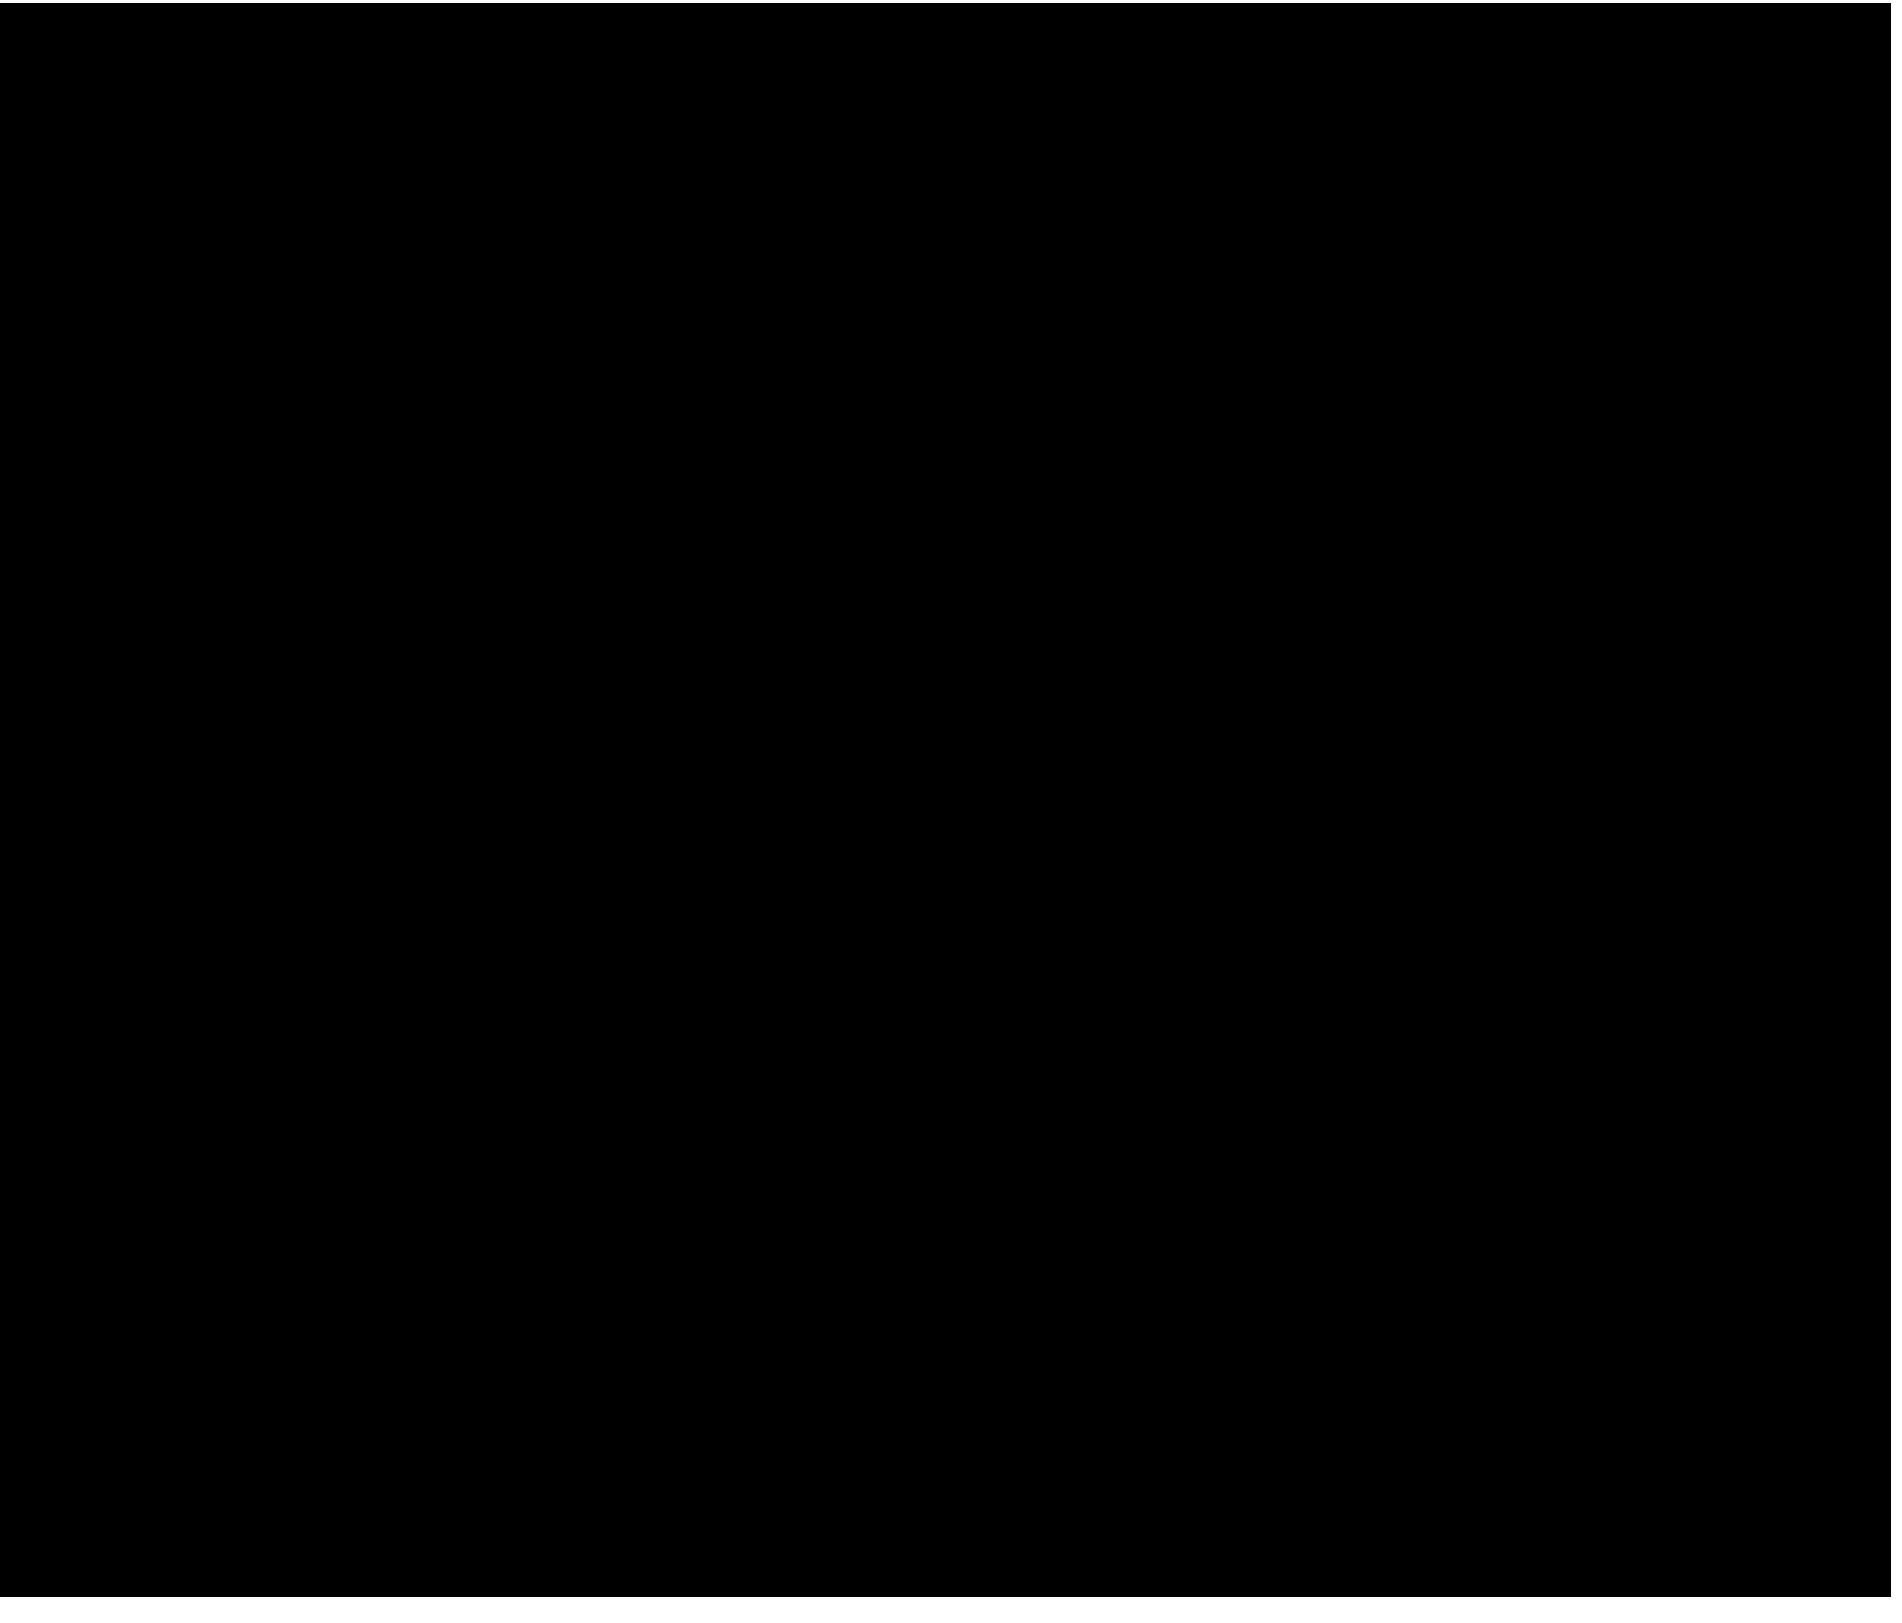 DerajLetterPatreon-short1.png